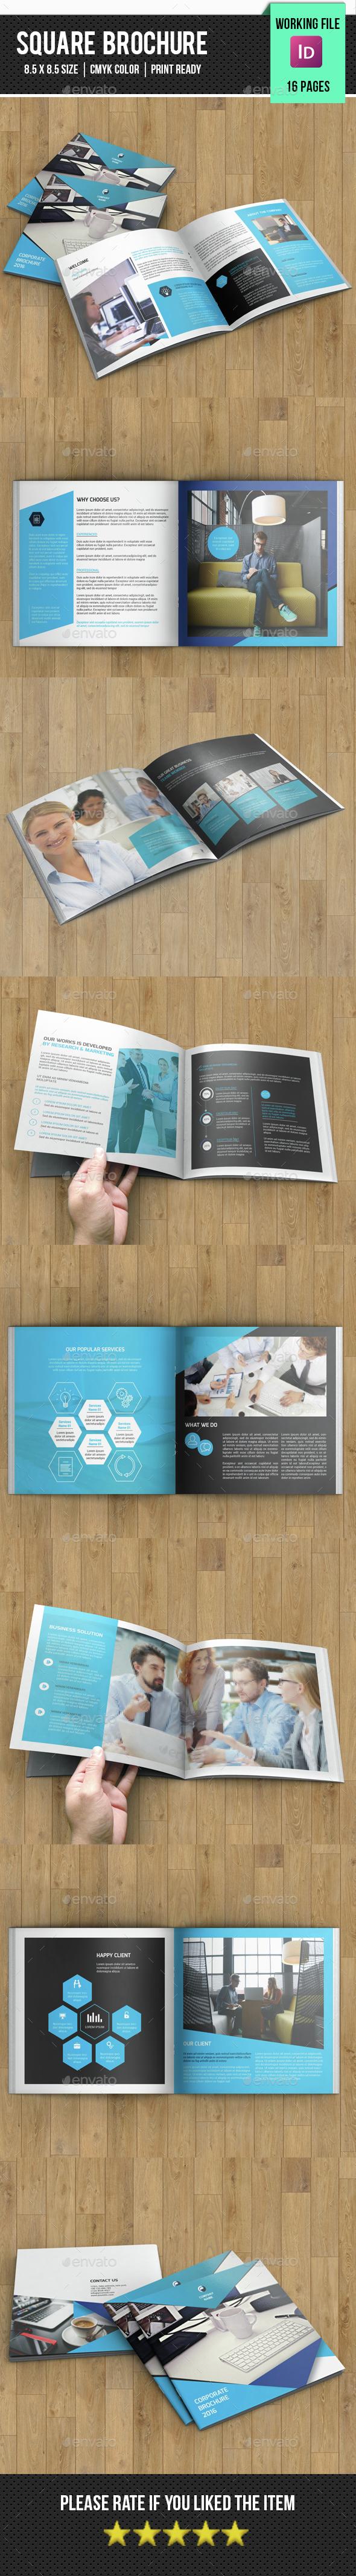 Square Corporate Brochure-V80 - Corporate Brochures